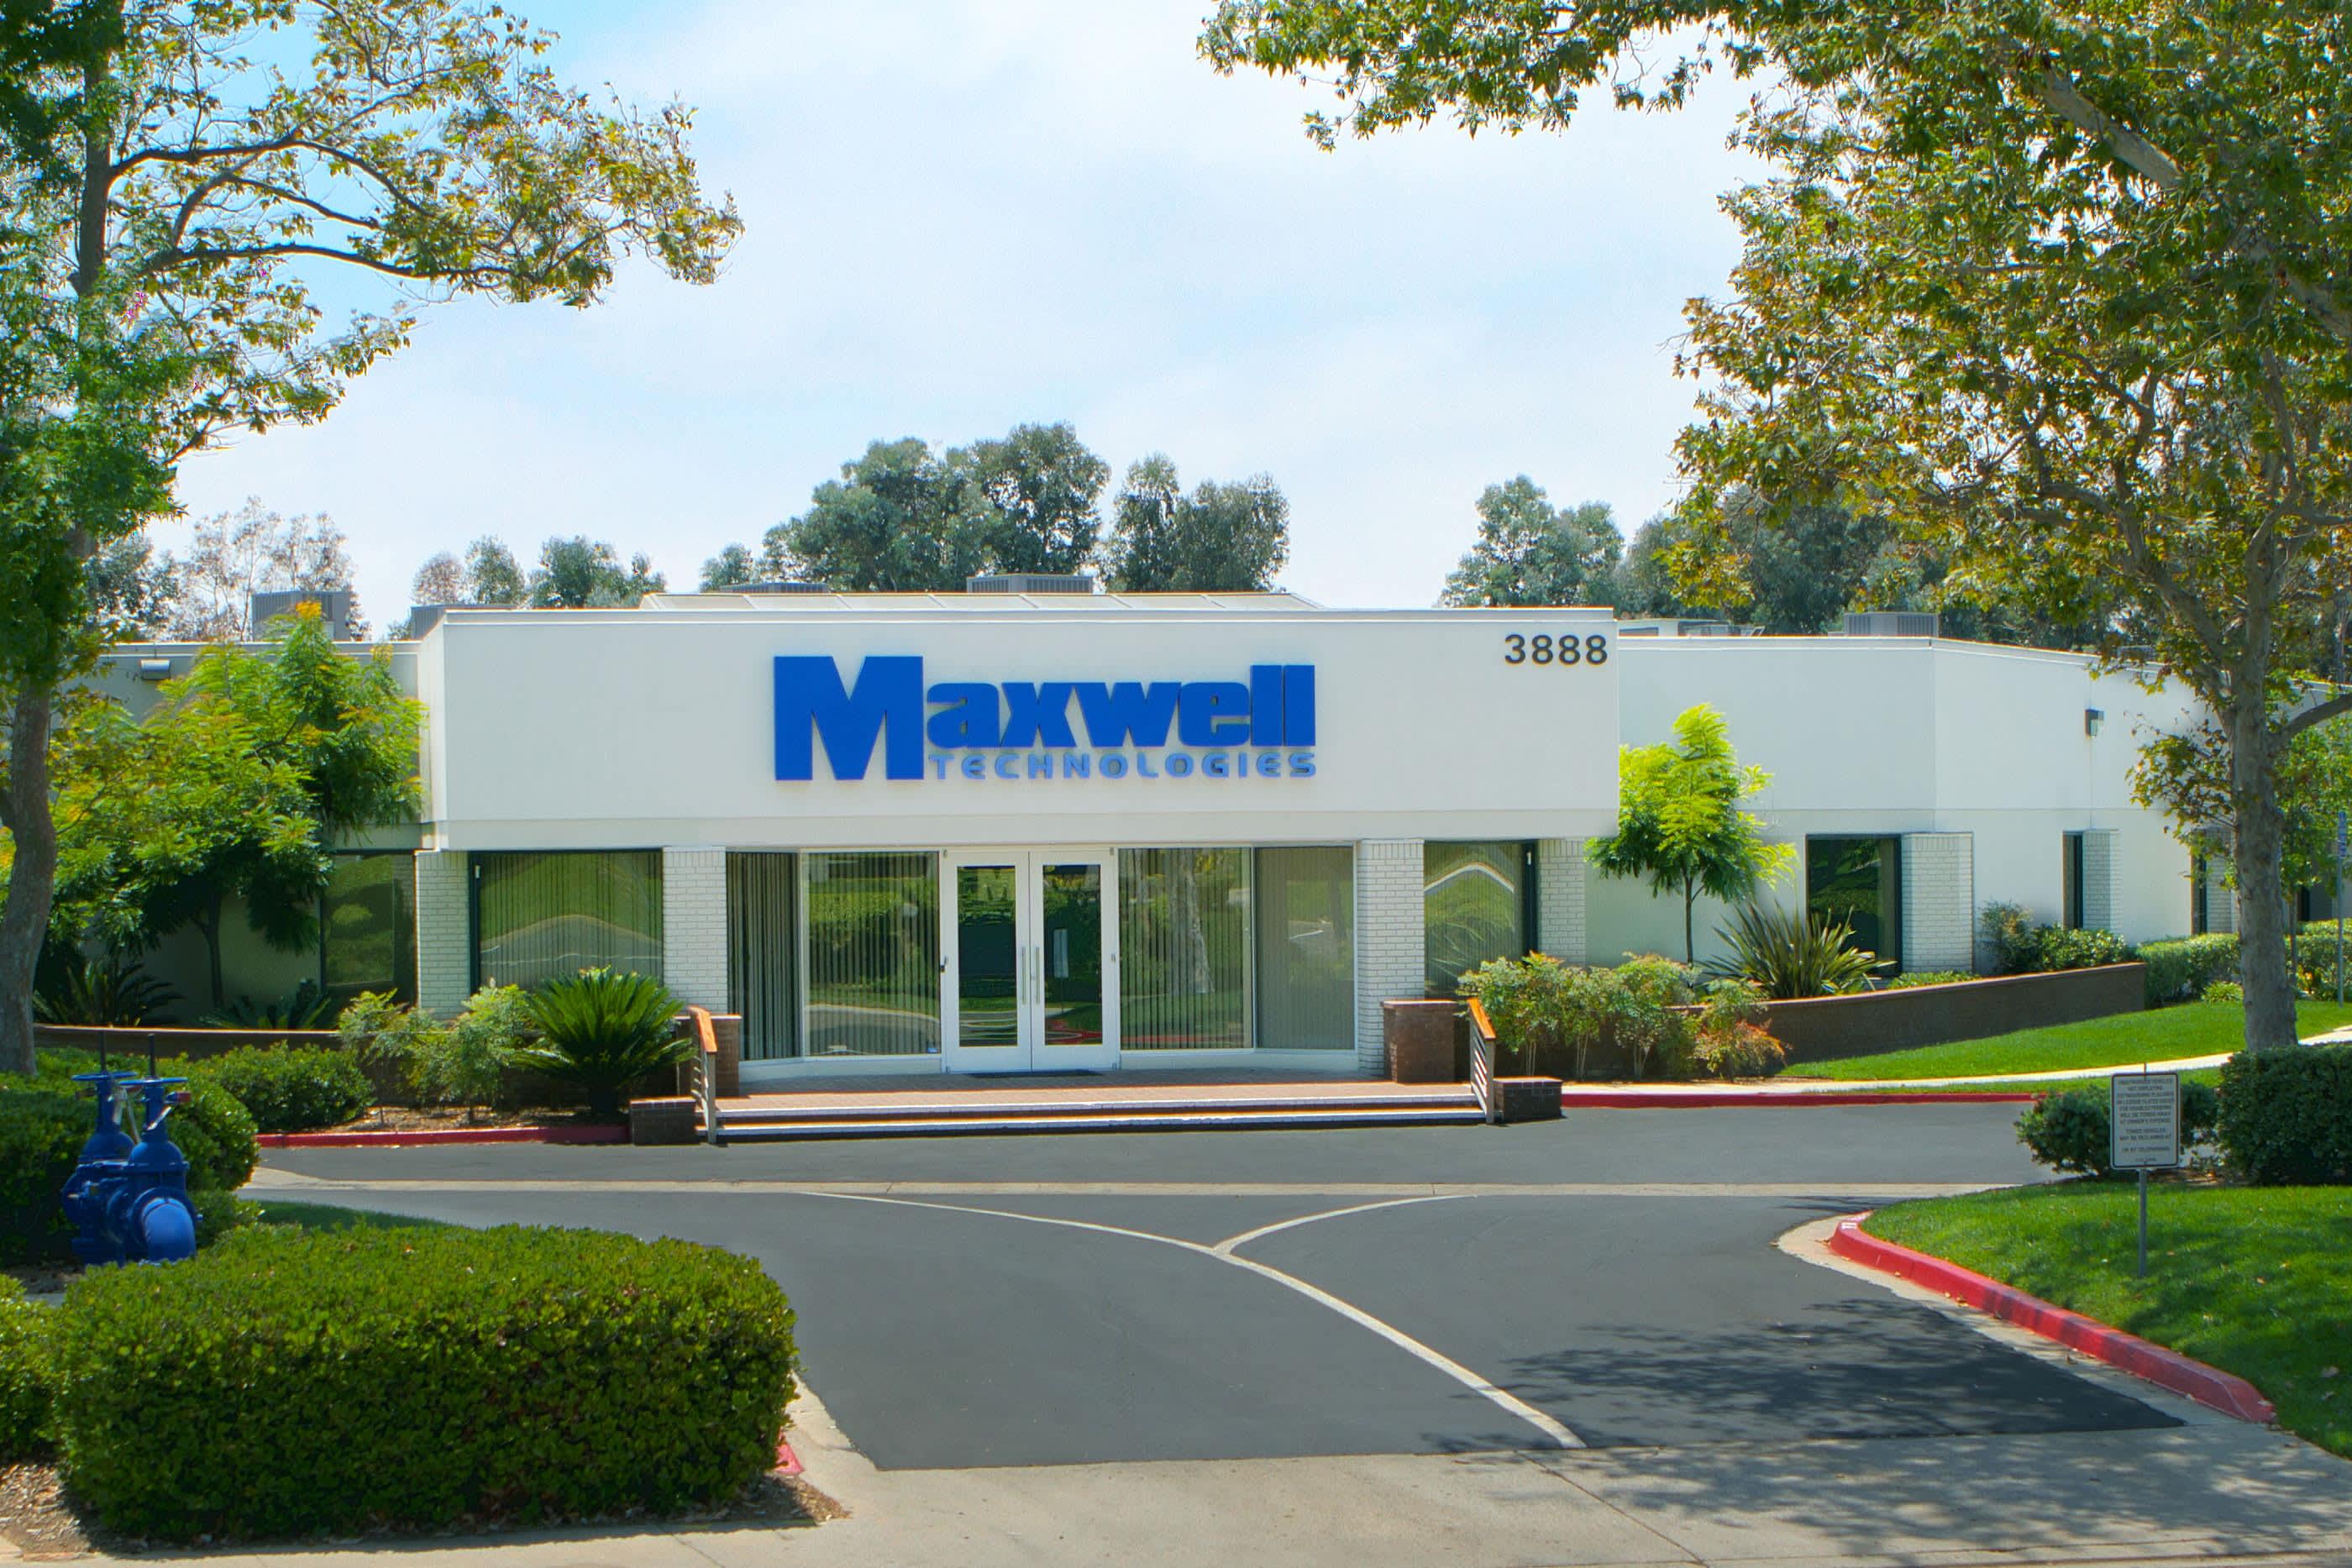 Tesla to buy energy tech company Maxwell Technologies for